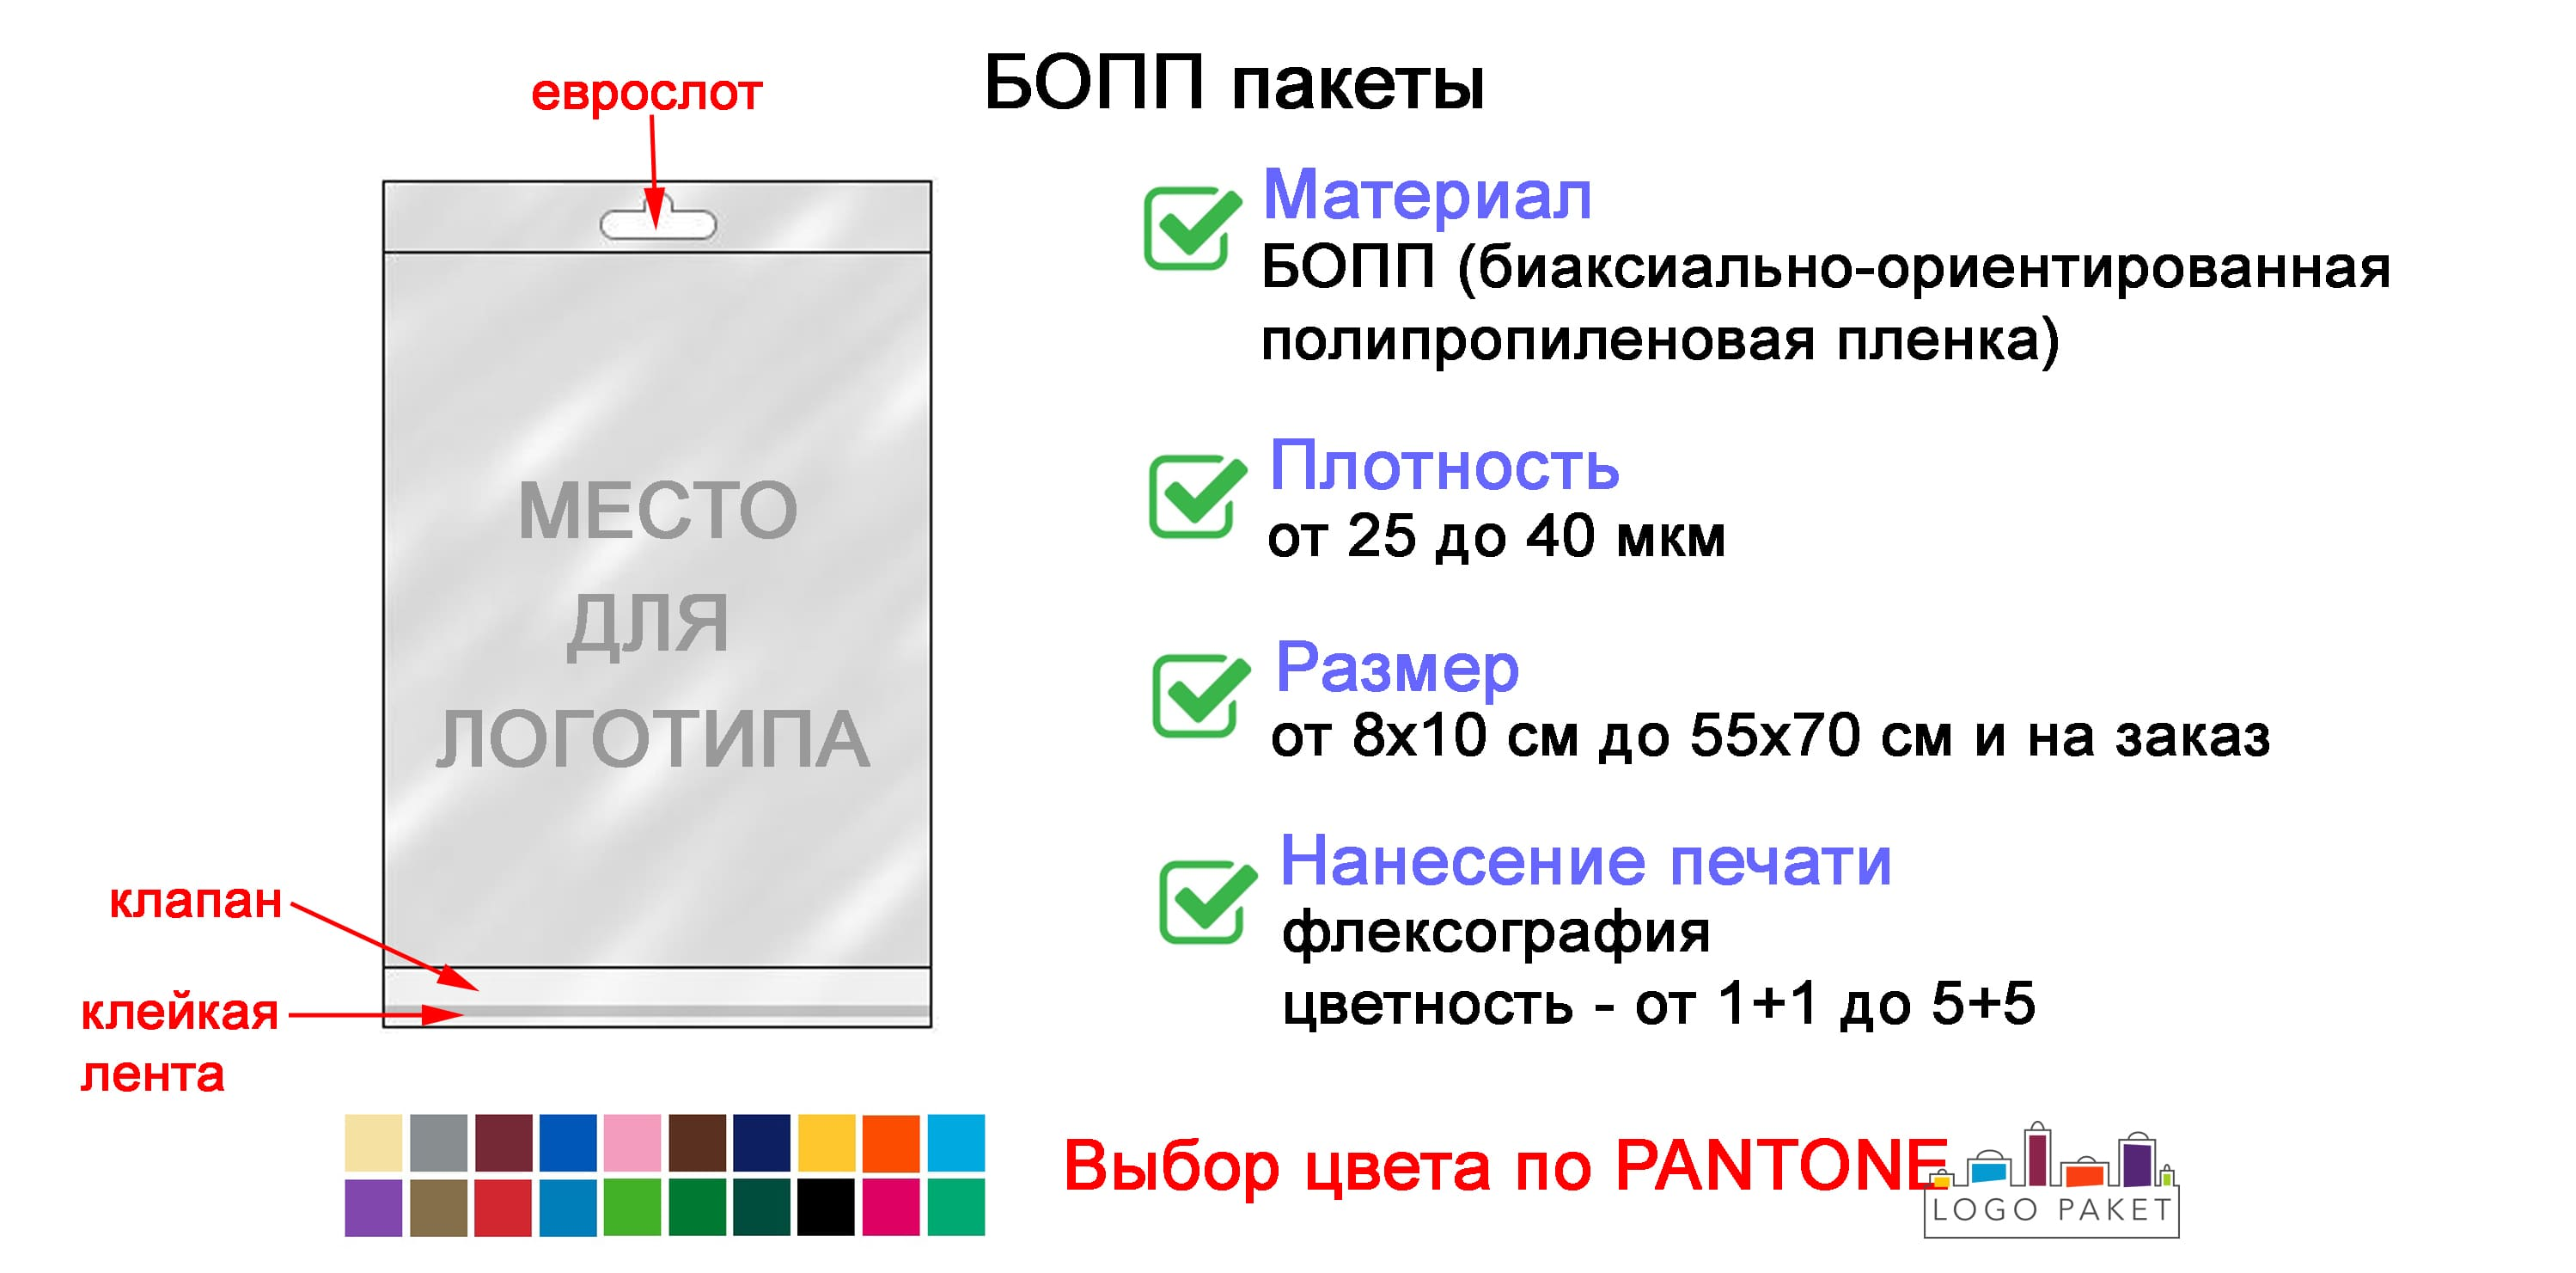 БОПП пакеты инфографика